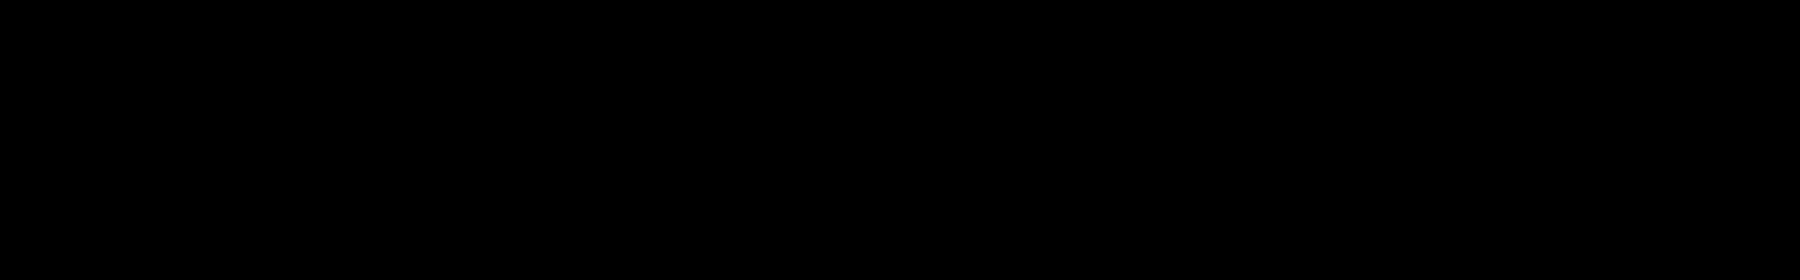 Granular Toppers audio waveform